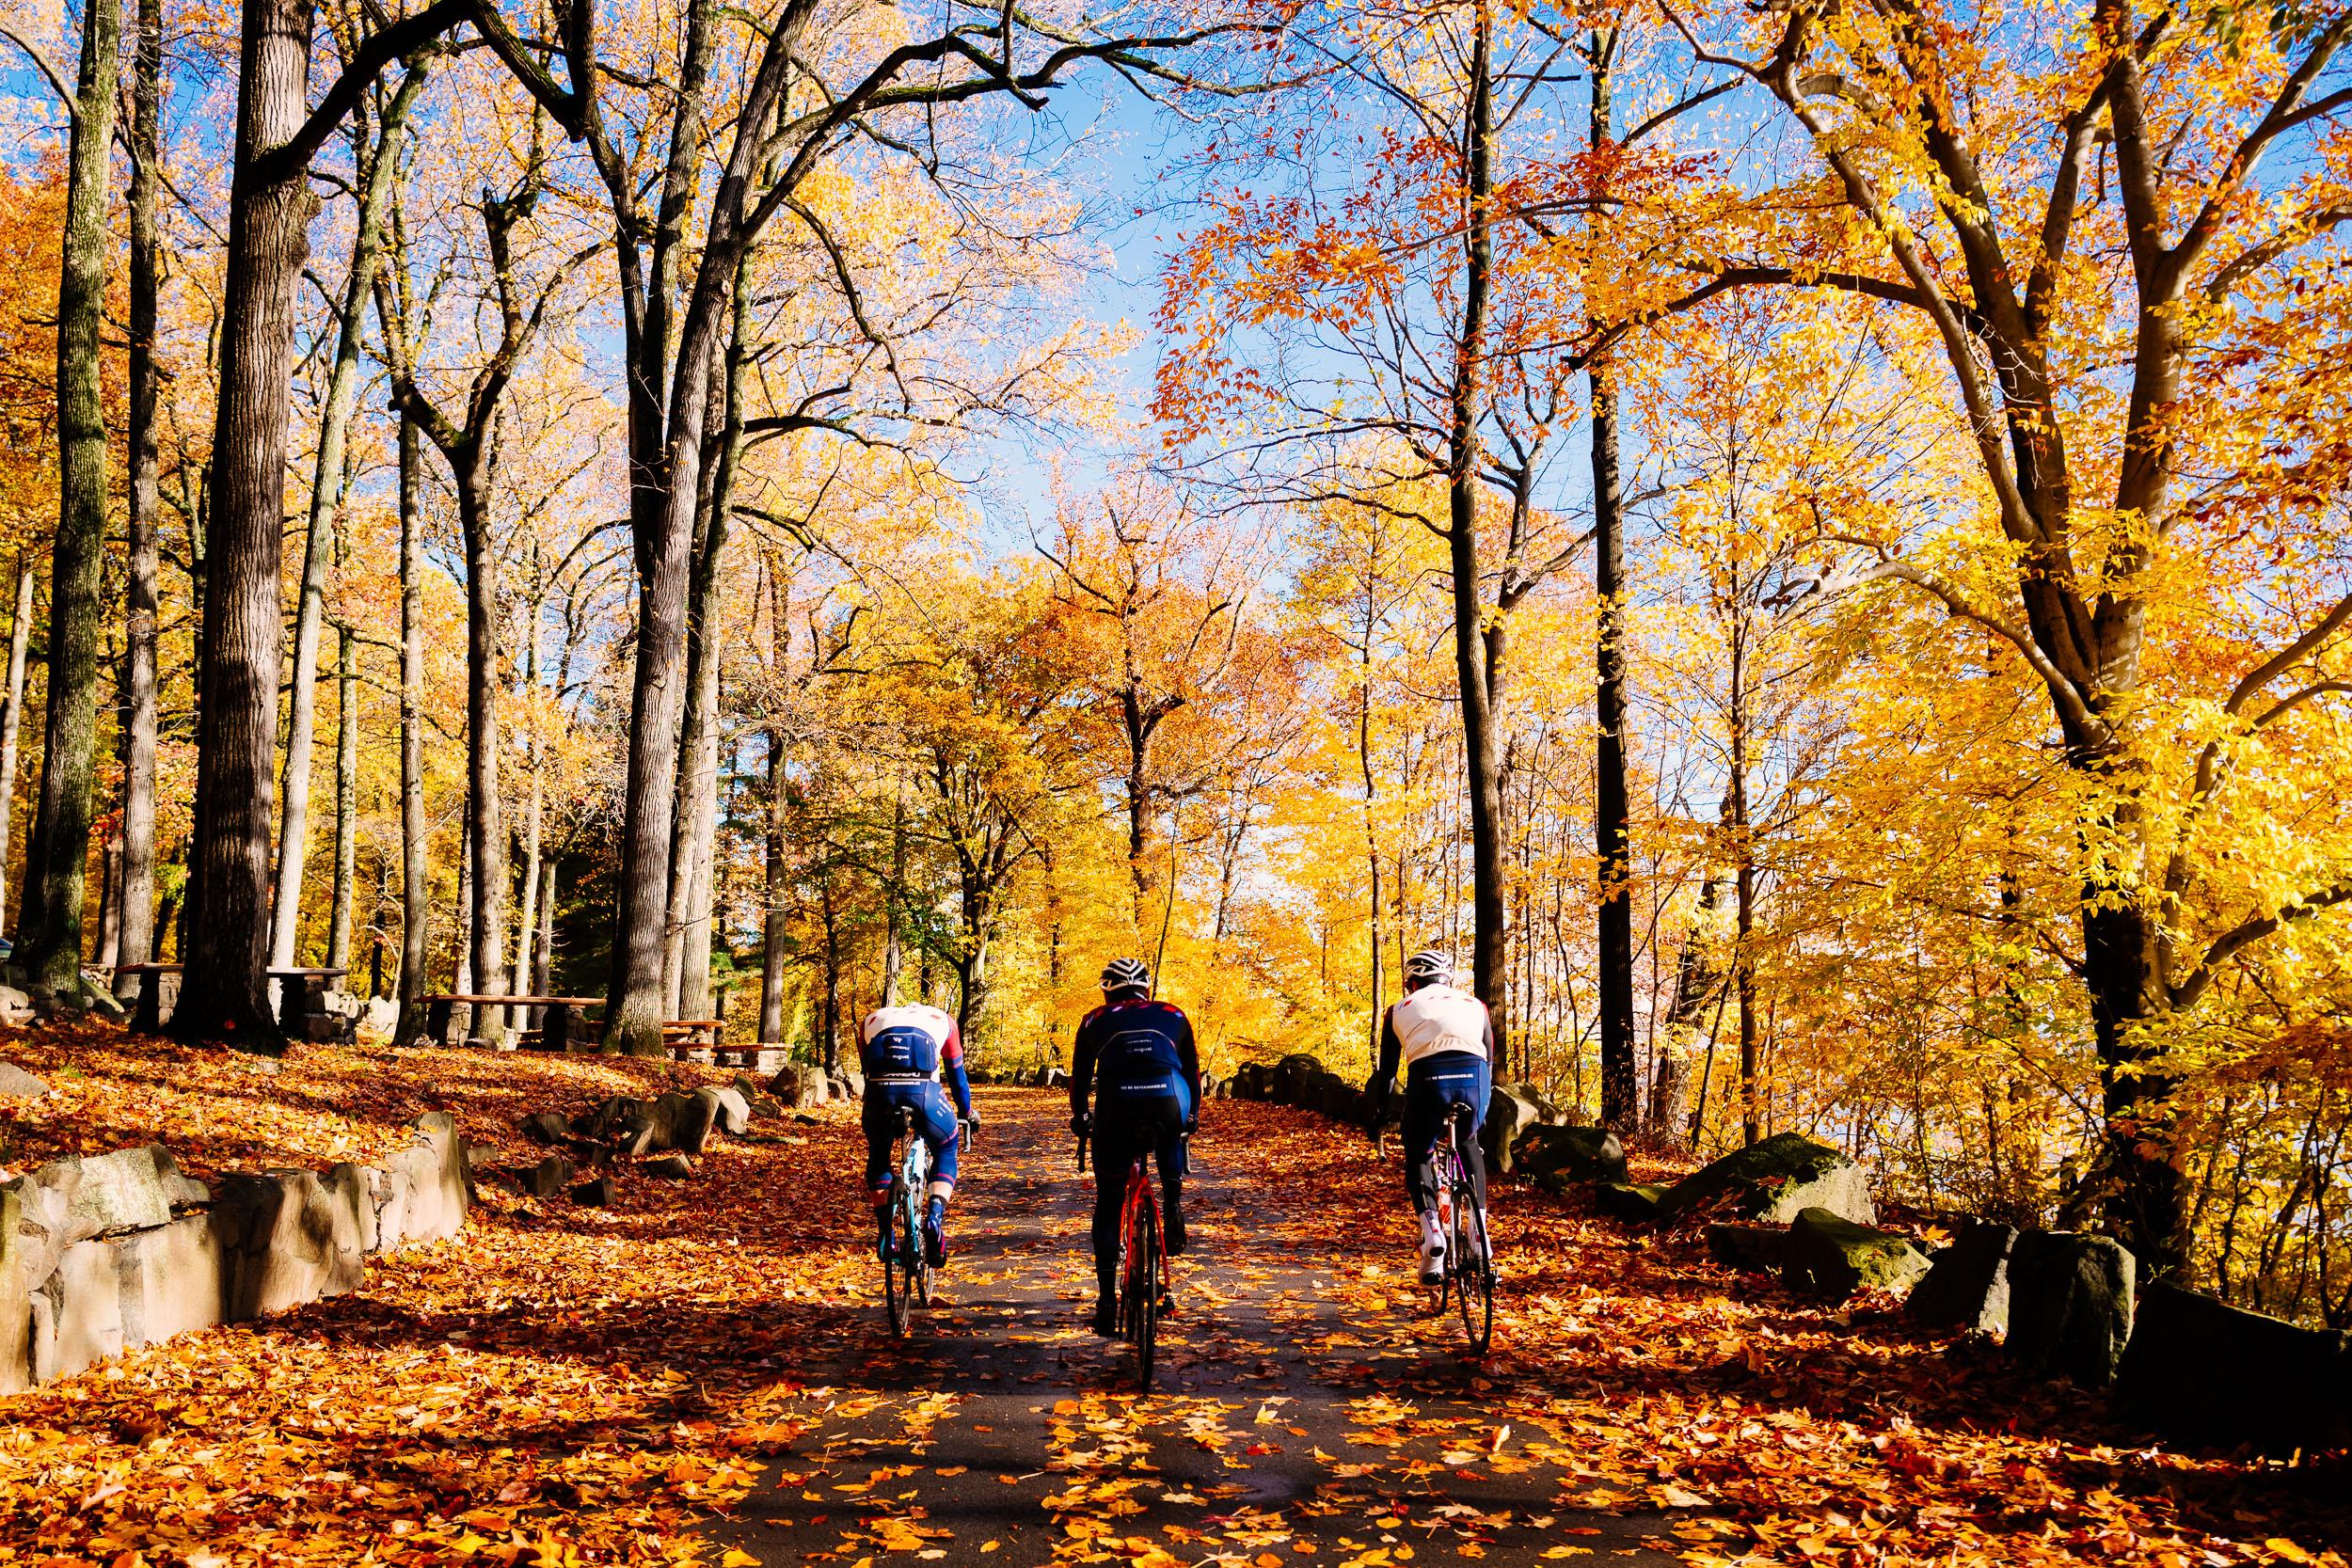 photo-rhetoric-to-be-determined-river-road-fall-foliage-5028.jpg